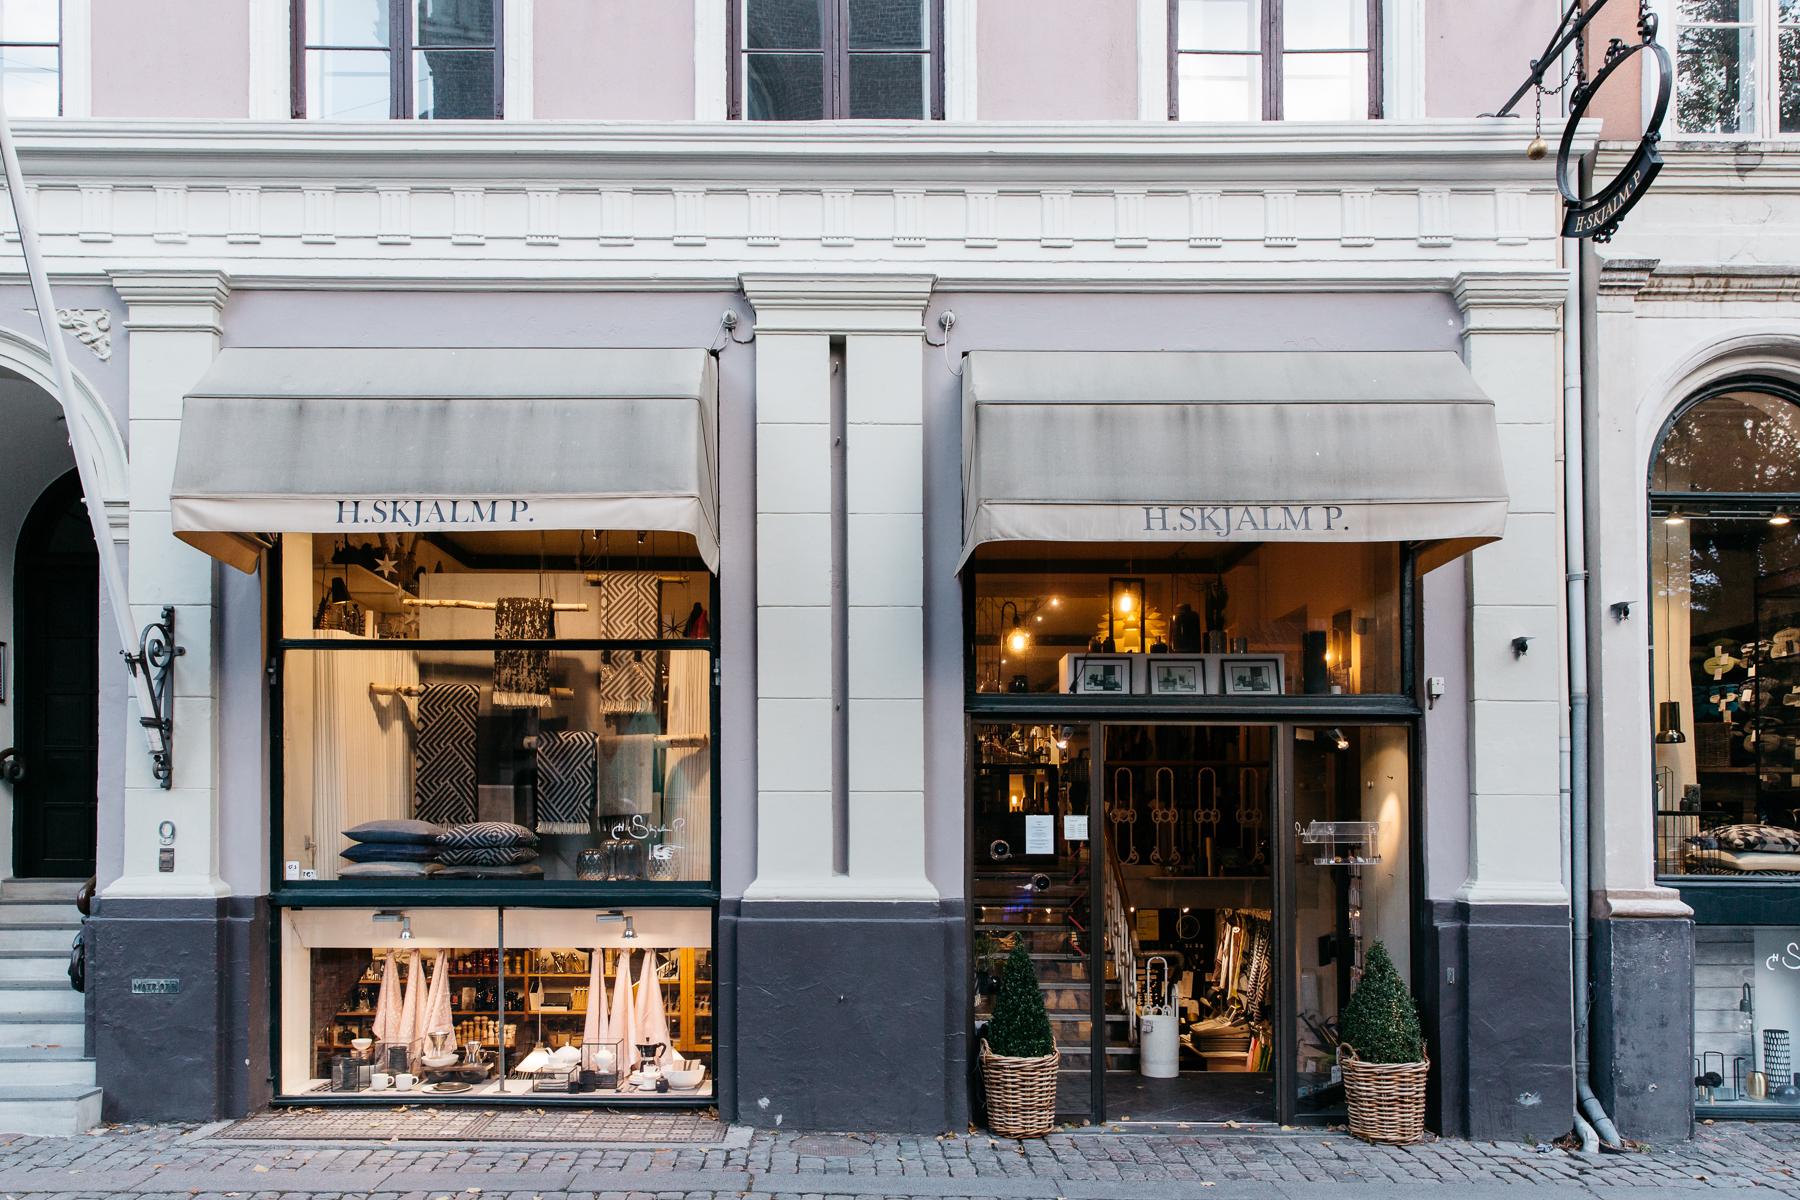 cph-stores-1.jpg